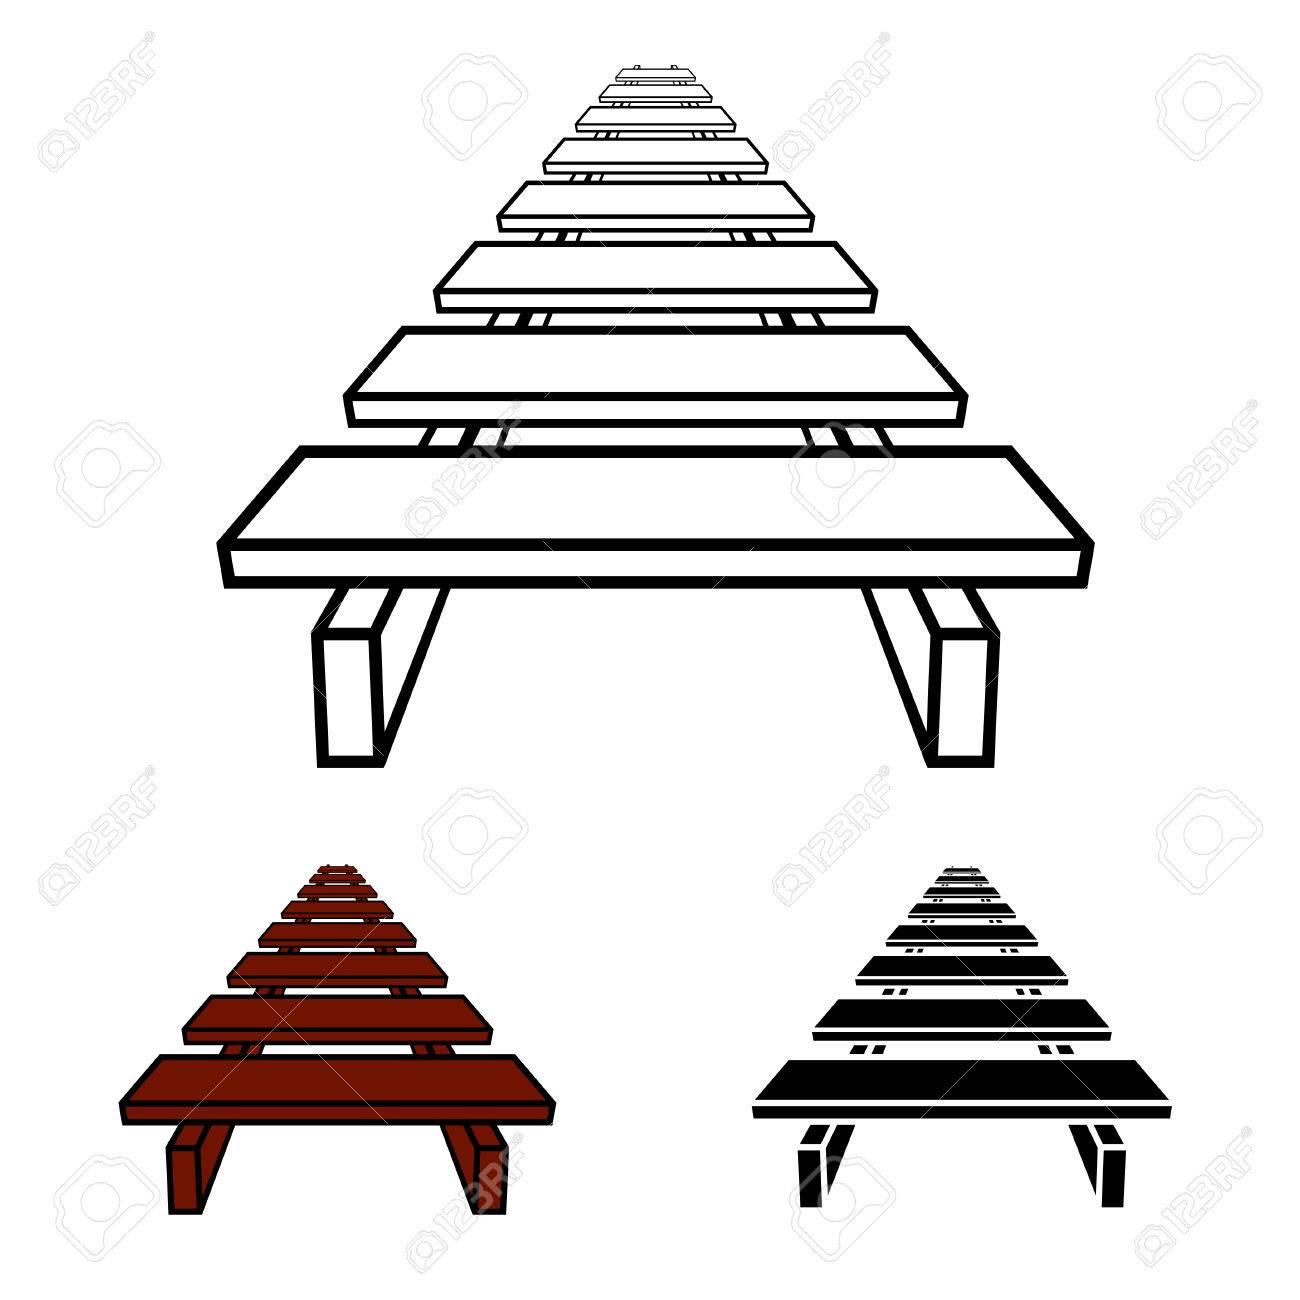 3d simple wooden footbridge black symbol royalty free cliparts 3d simple wooden footbridge black symbol stock vector 64144077 biocorpaavc